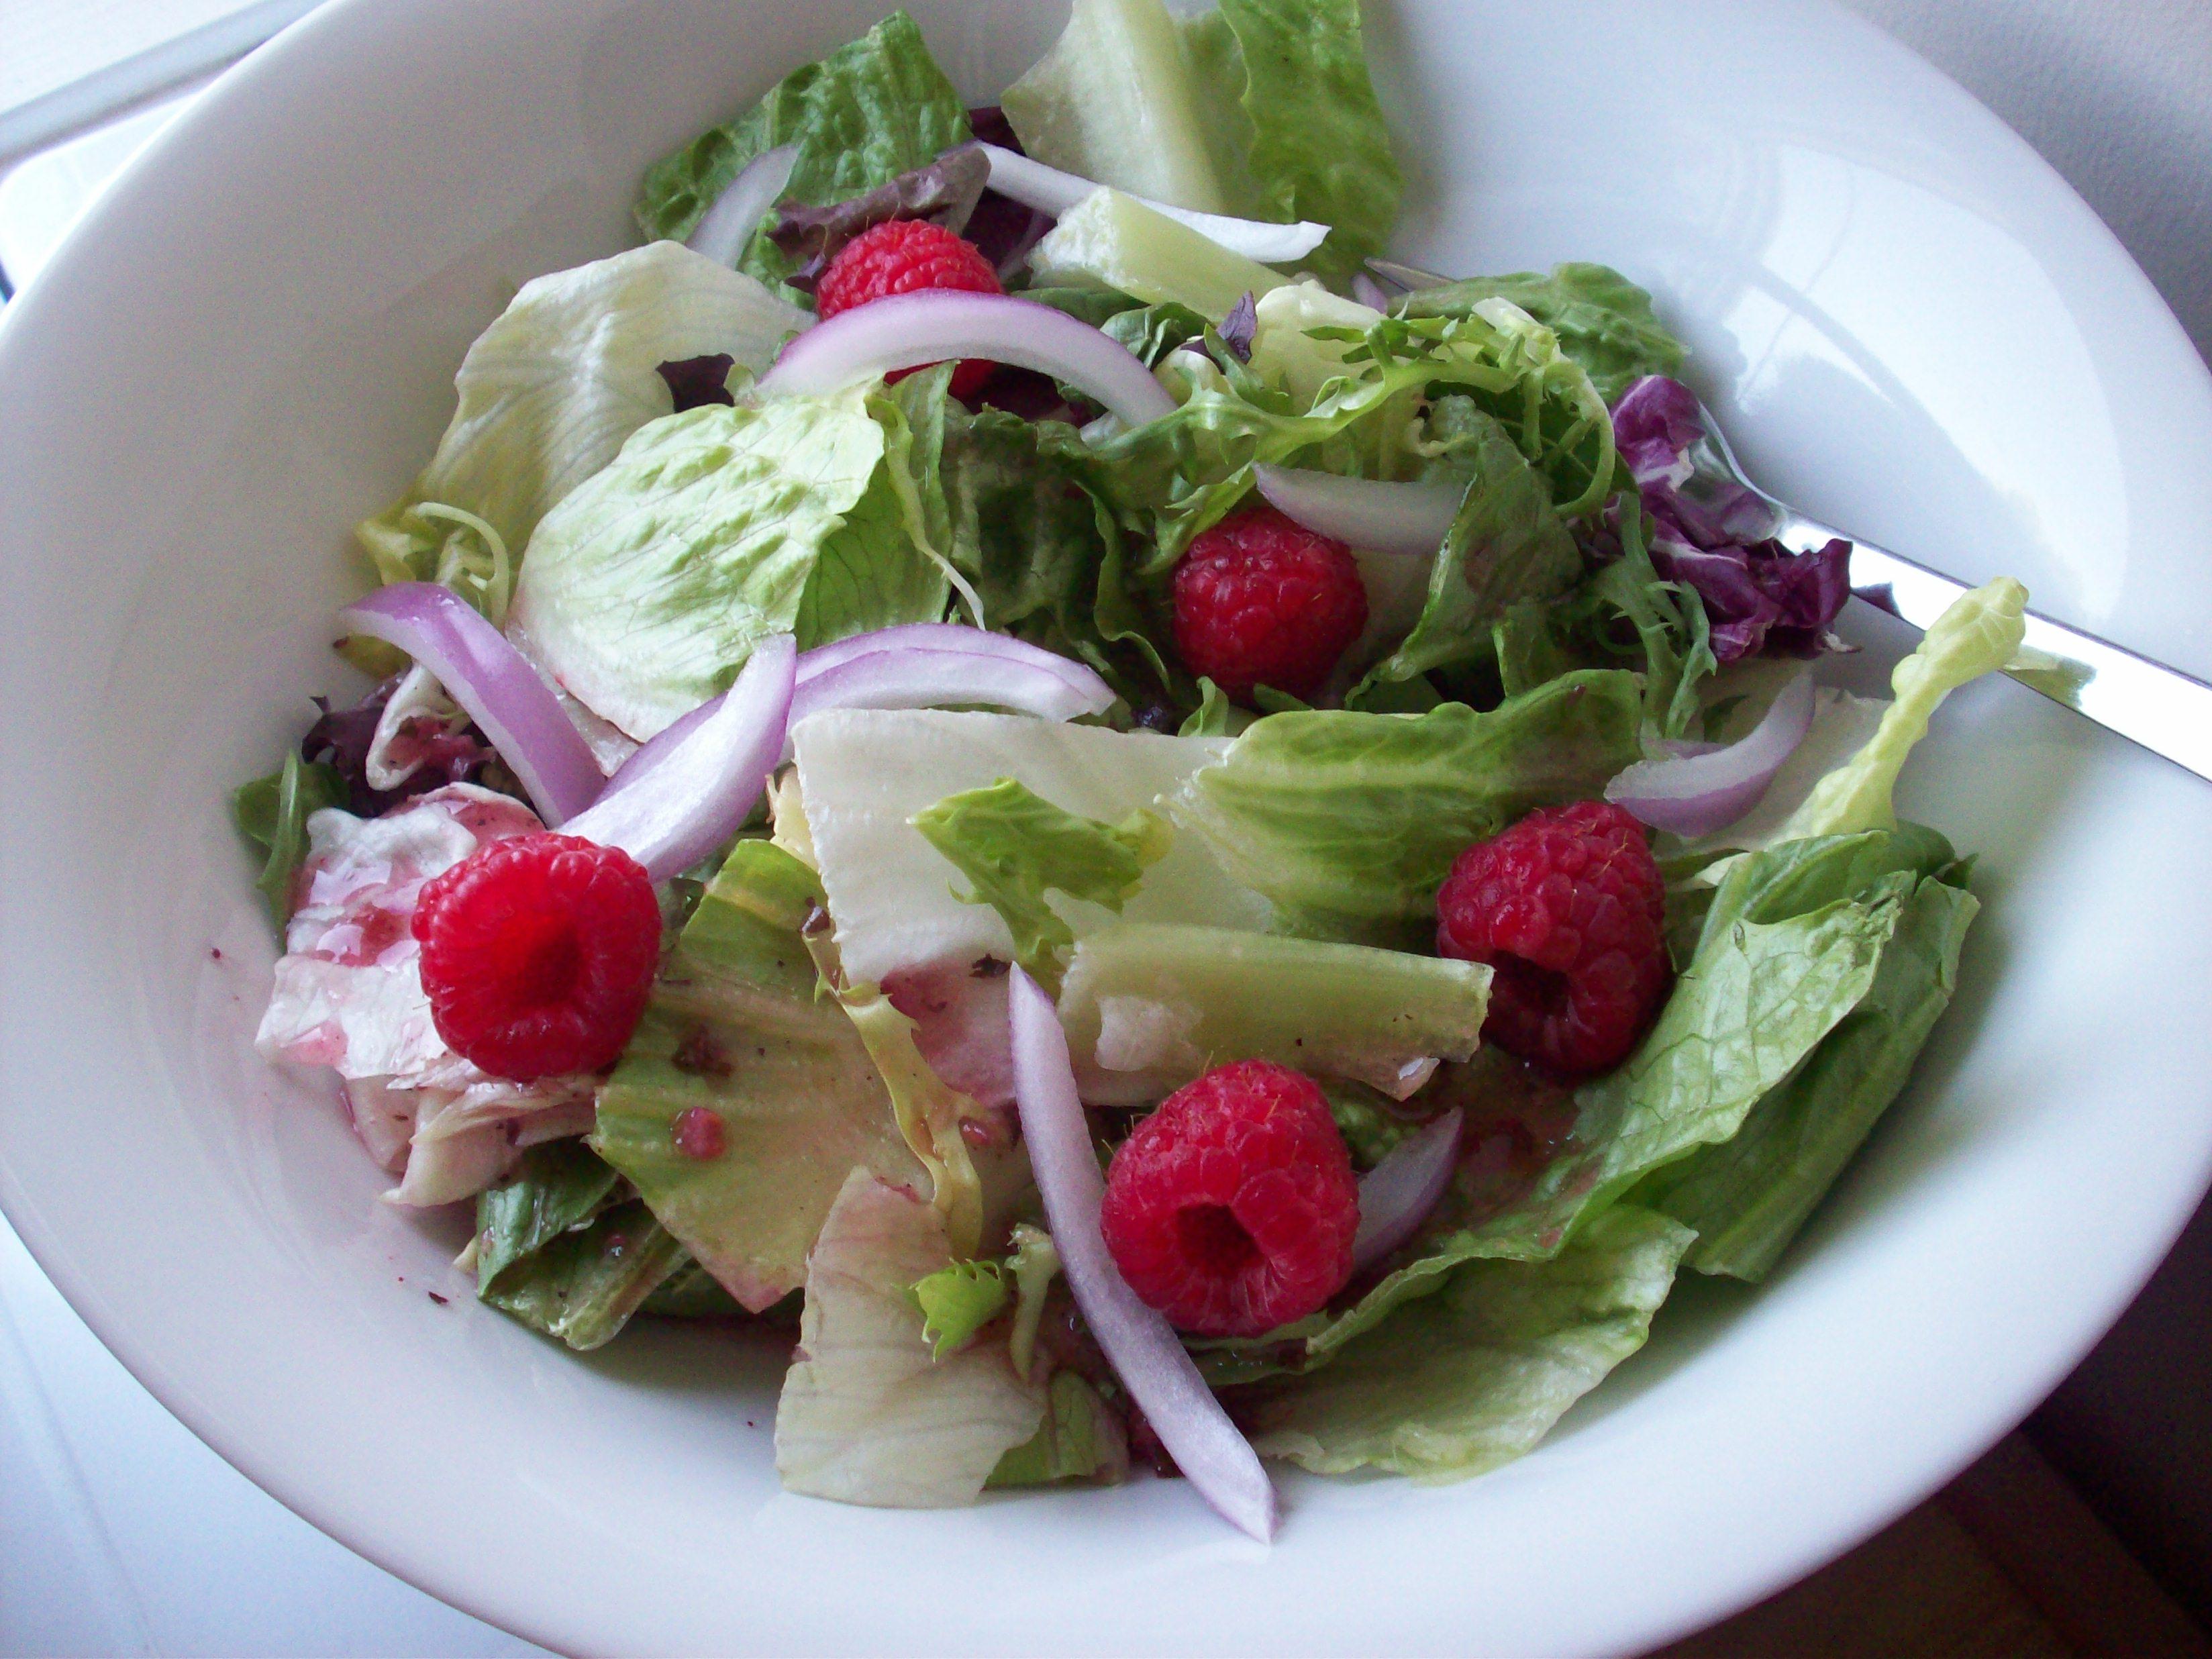 http://foodloader.net/cutie_2010-05-30_Salad.jpg